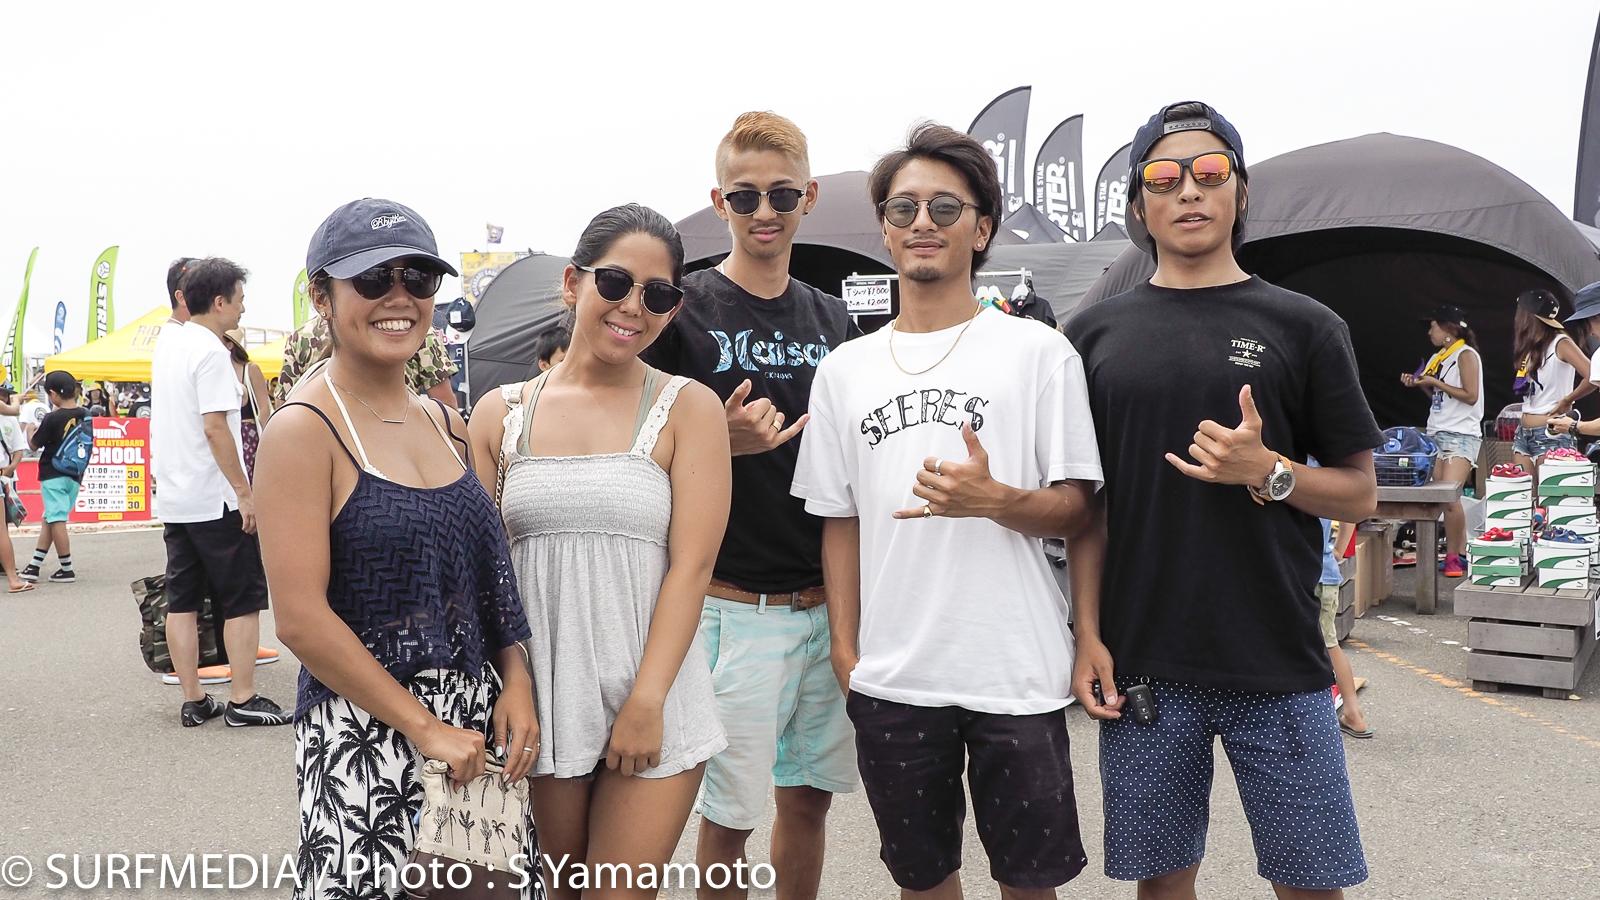 natsumi taoka-7170267